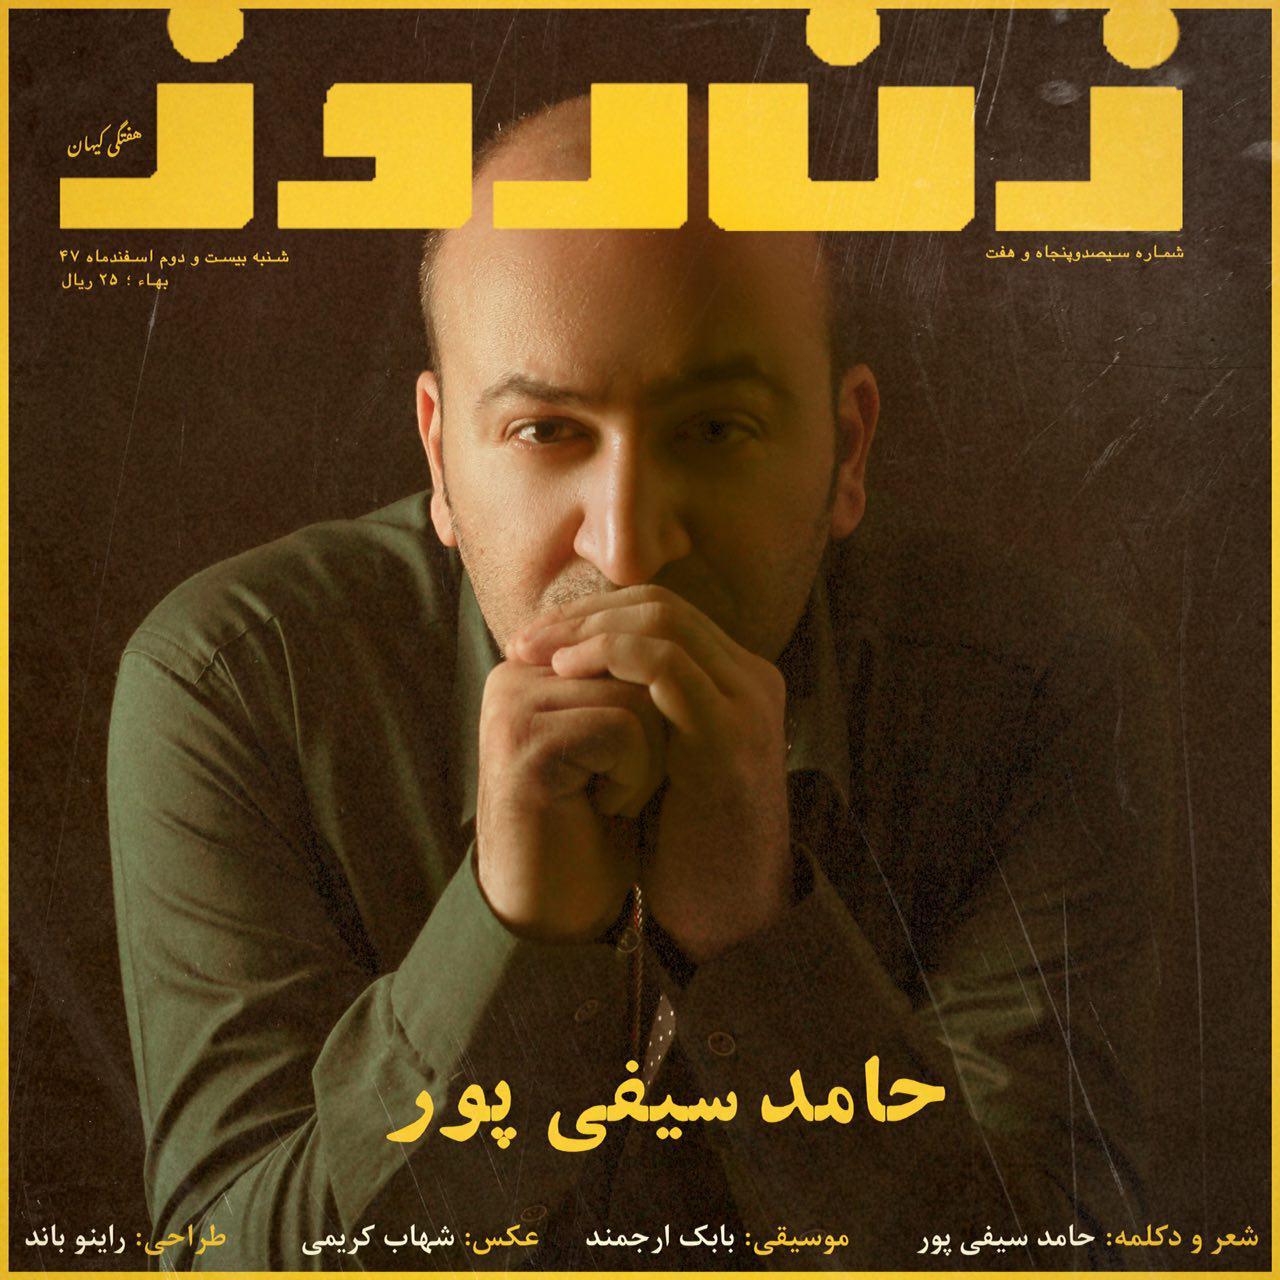 Hamed Seyfipour – Zane Rouz